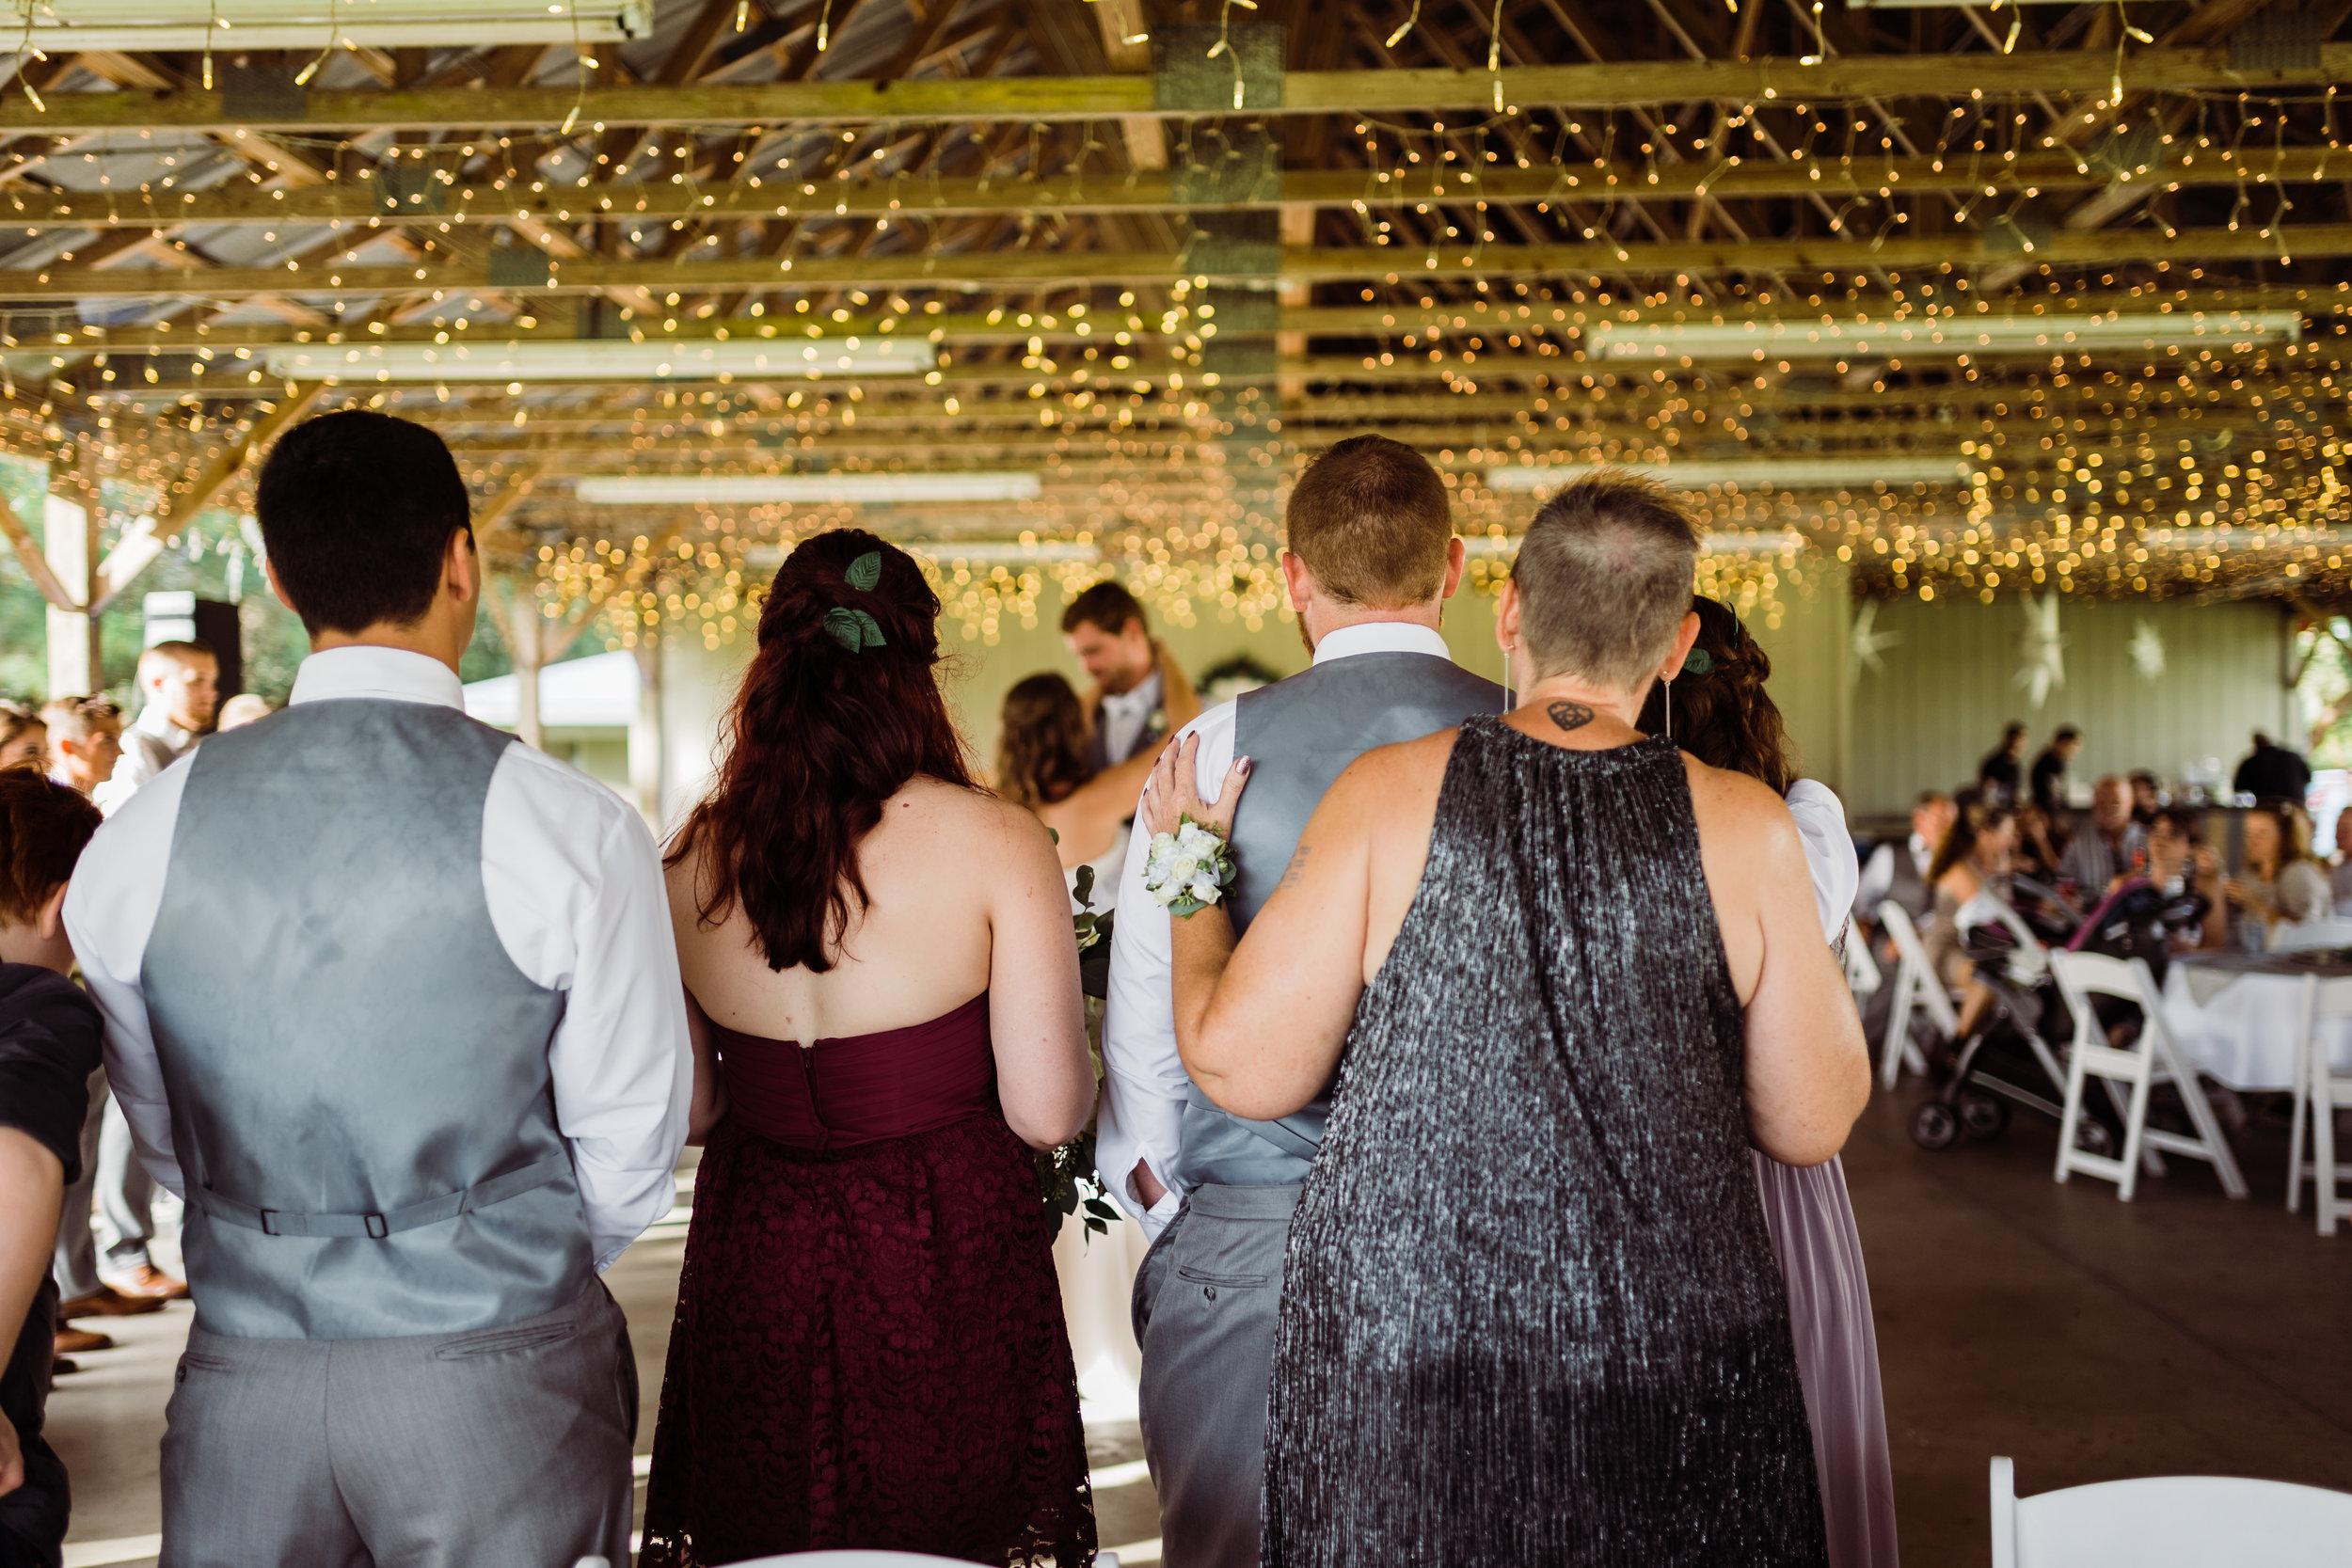 2017.10.14 Samantha and Matthew Crabtree Sarasota Wedding (449 of 708).jpg